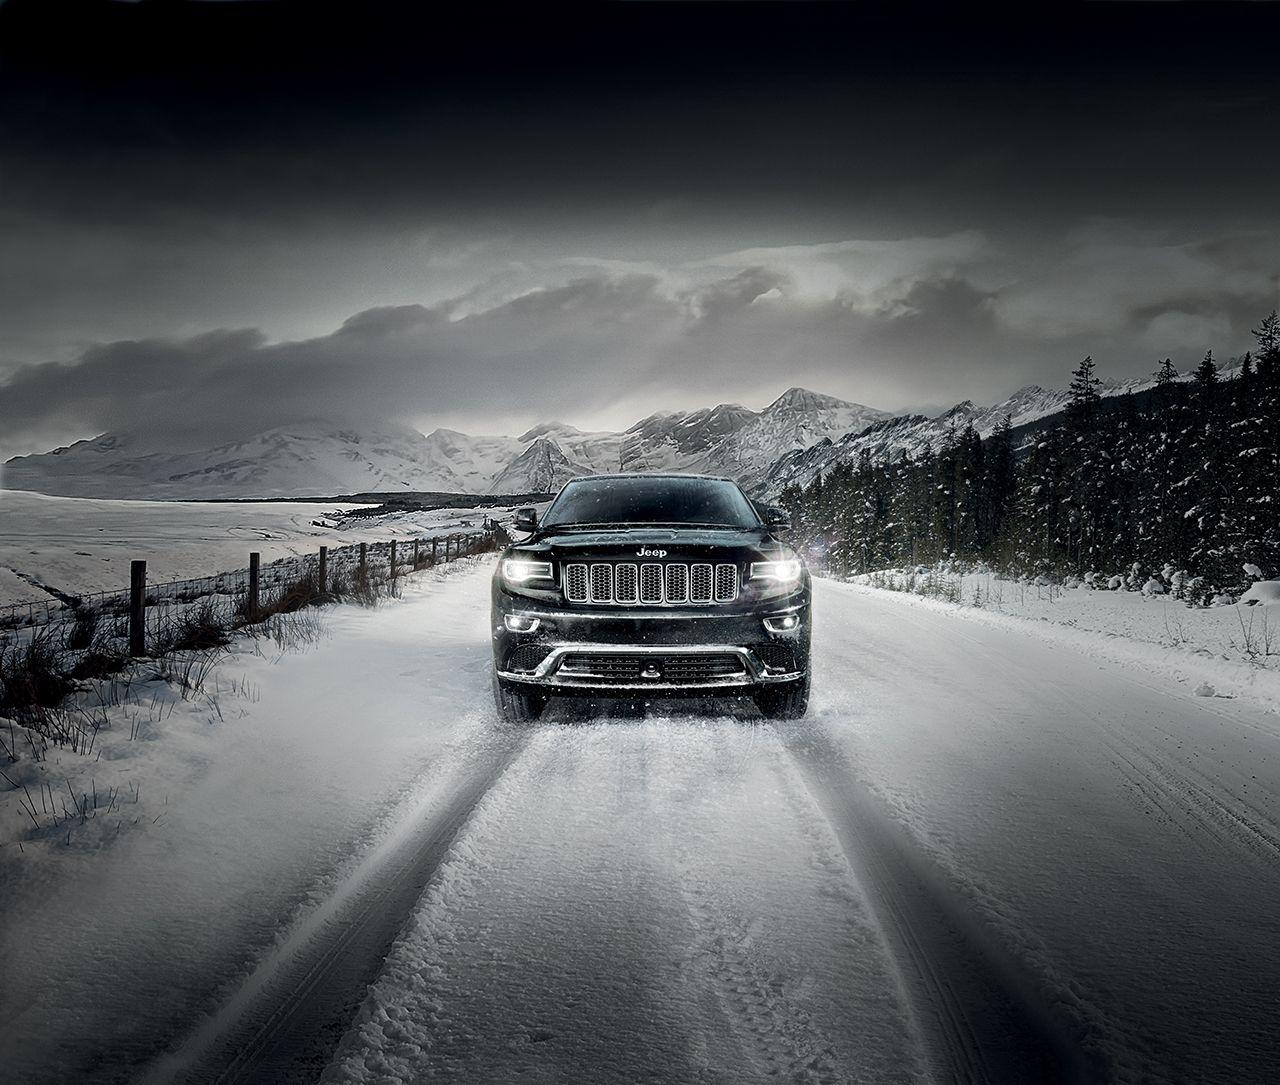 Winterproof: l'avventura invernale firmata Jeep